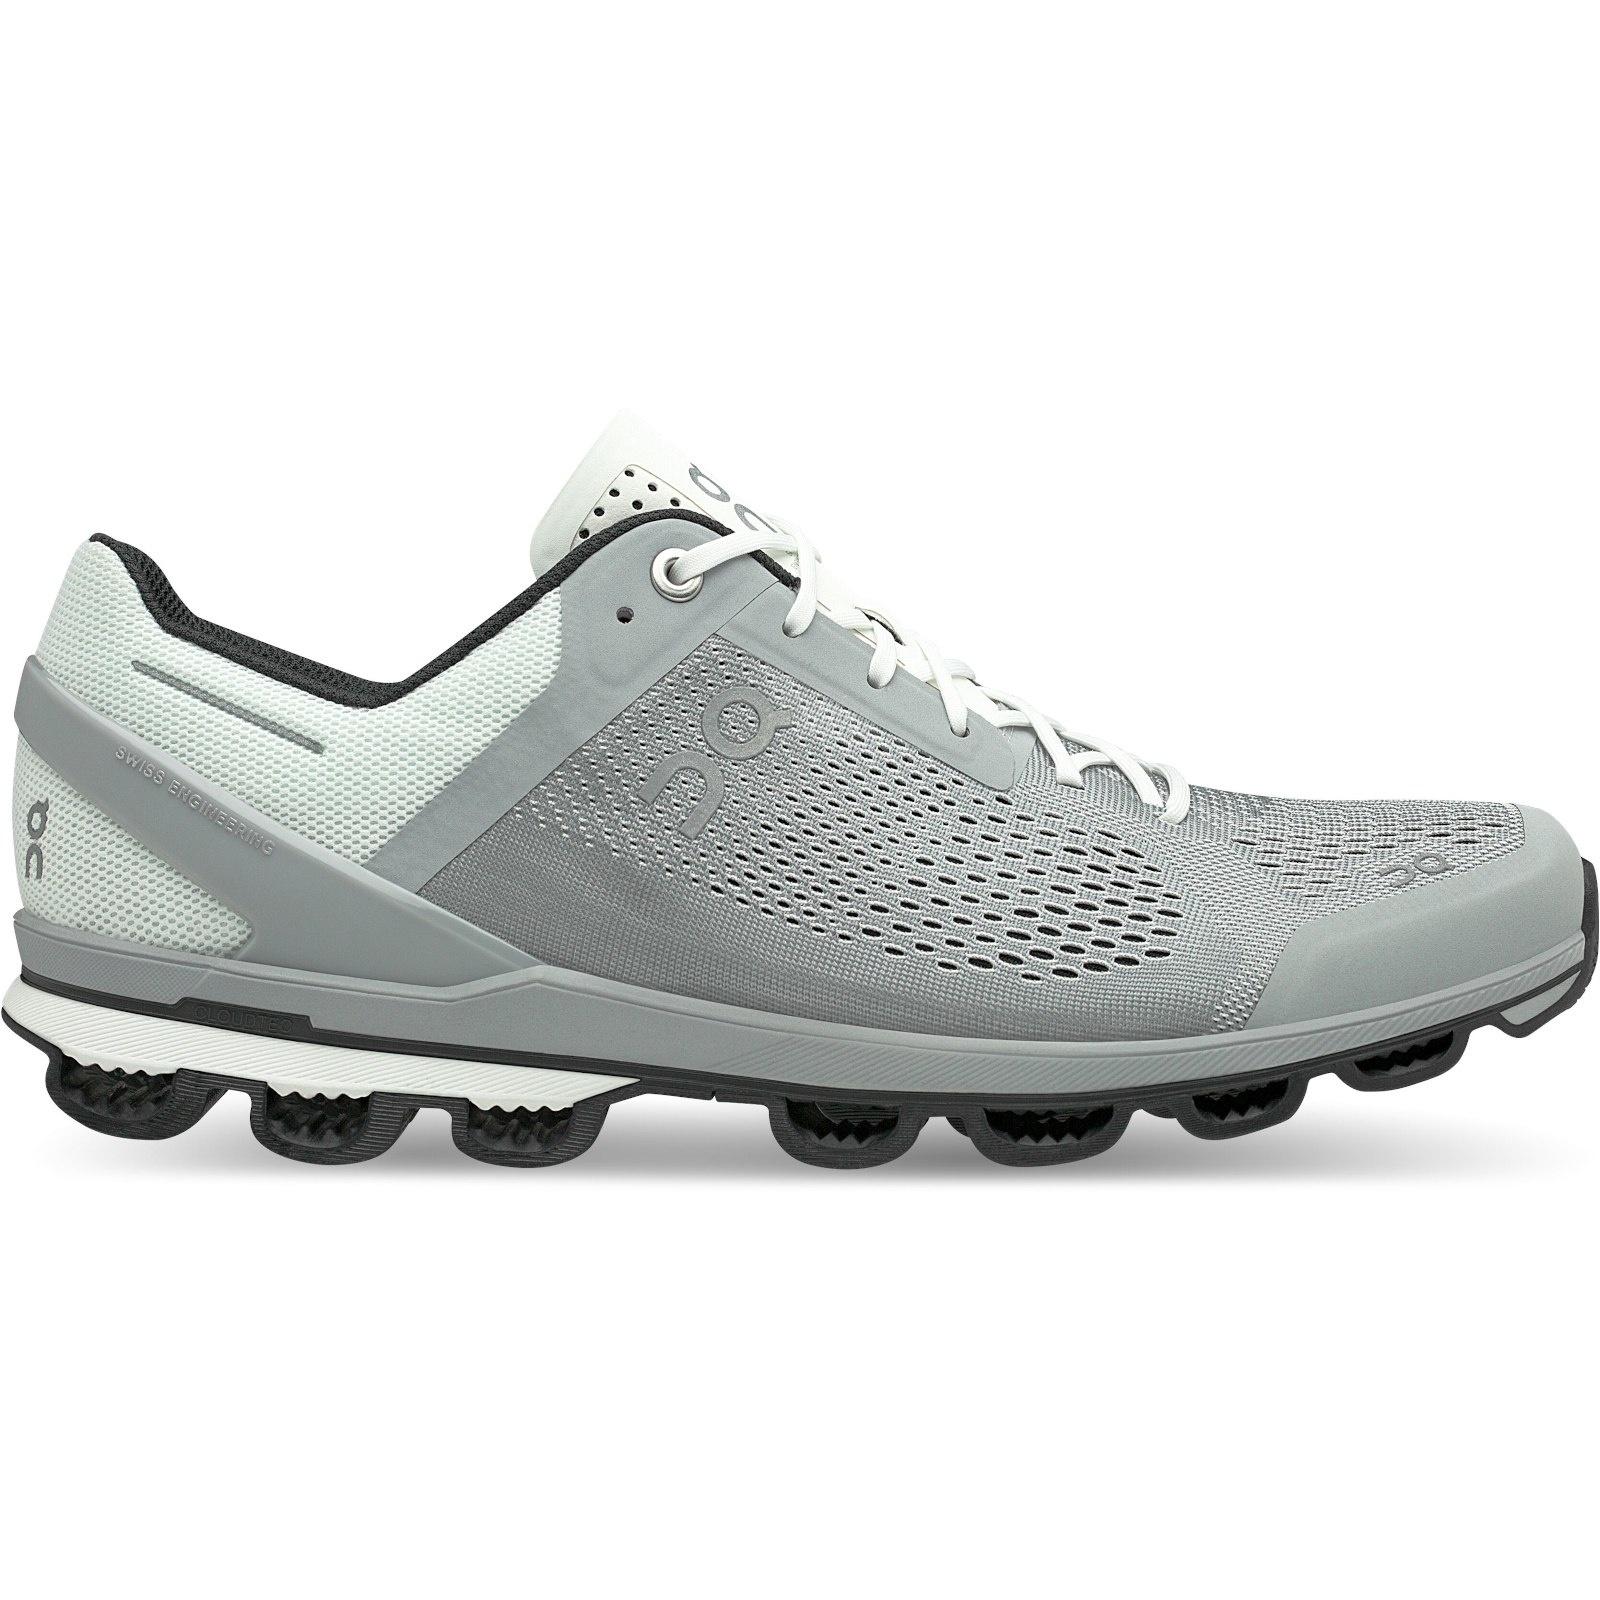 ON CLOUD On Running Women's Cloudsurfer Shoes